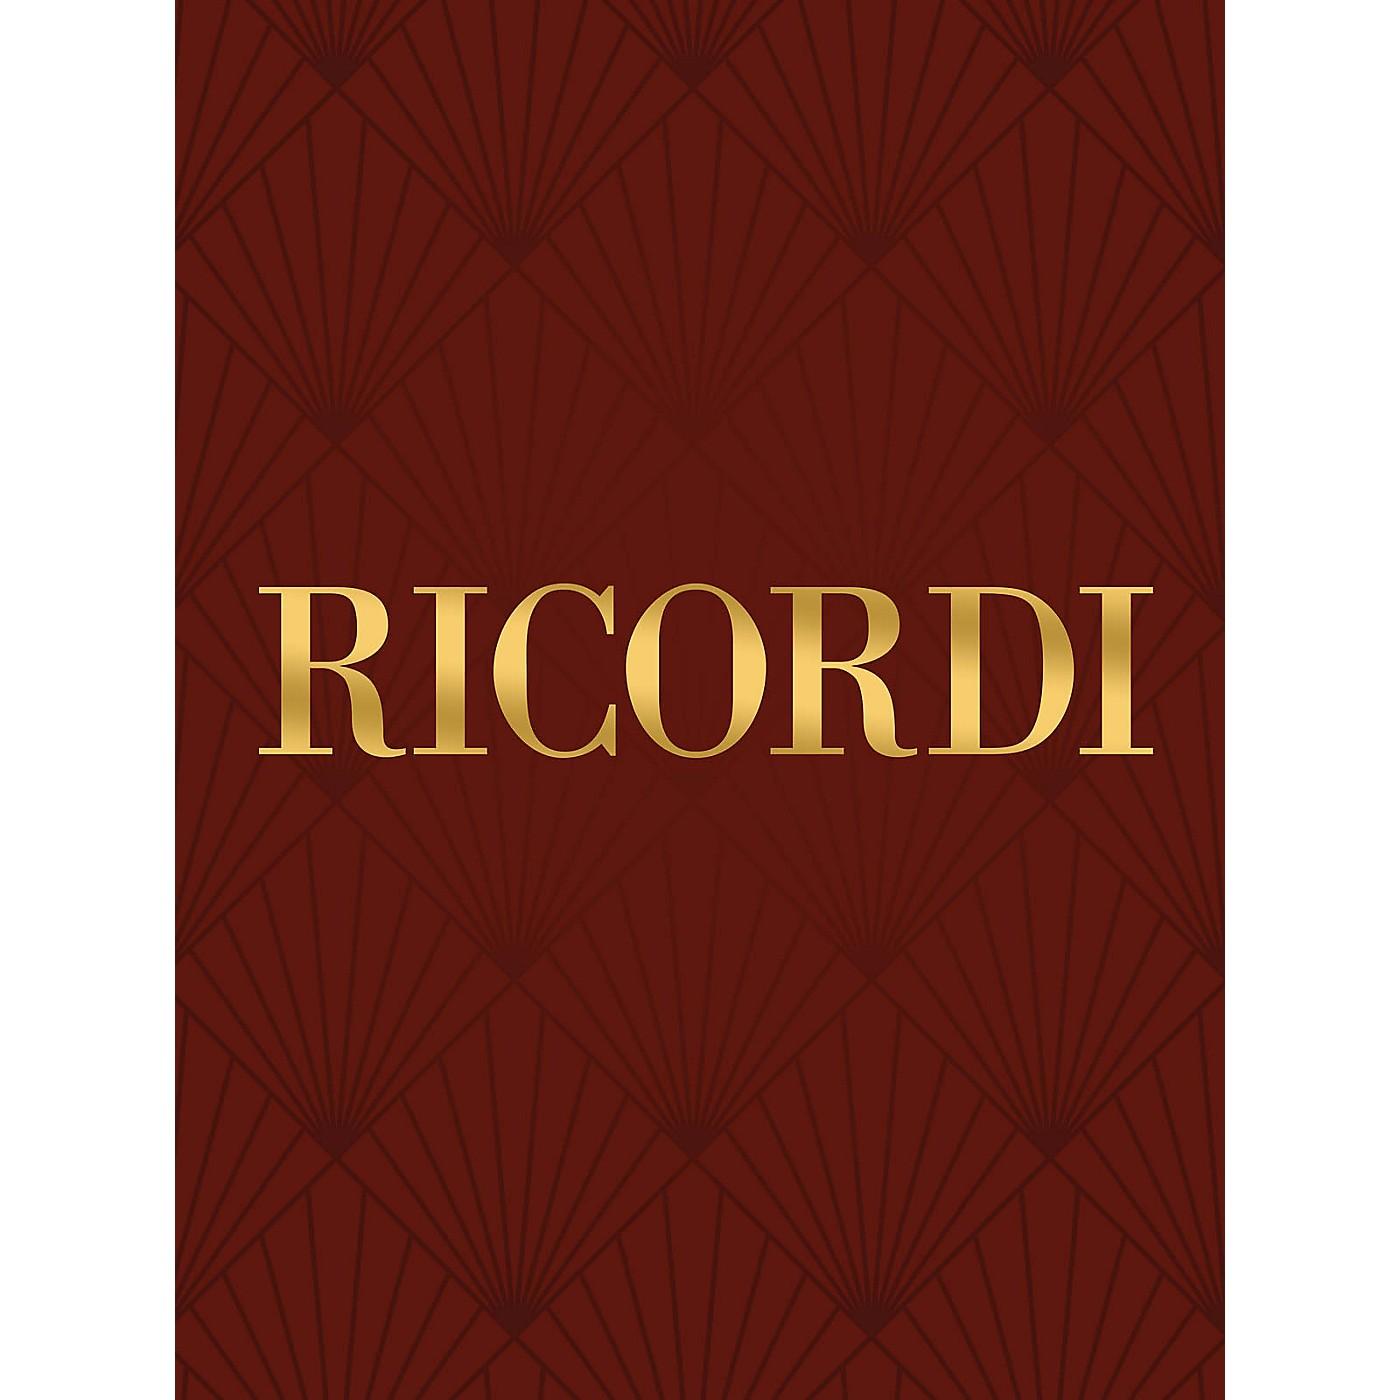 Ricordi Cantolopera: Arie Per Soprano - Gold MGB Series by Giacomo Puccini thumbnail